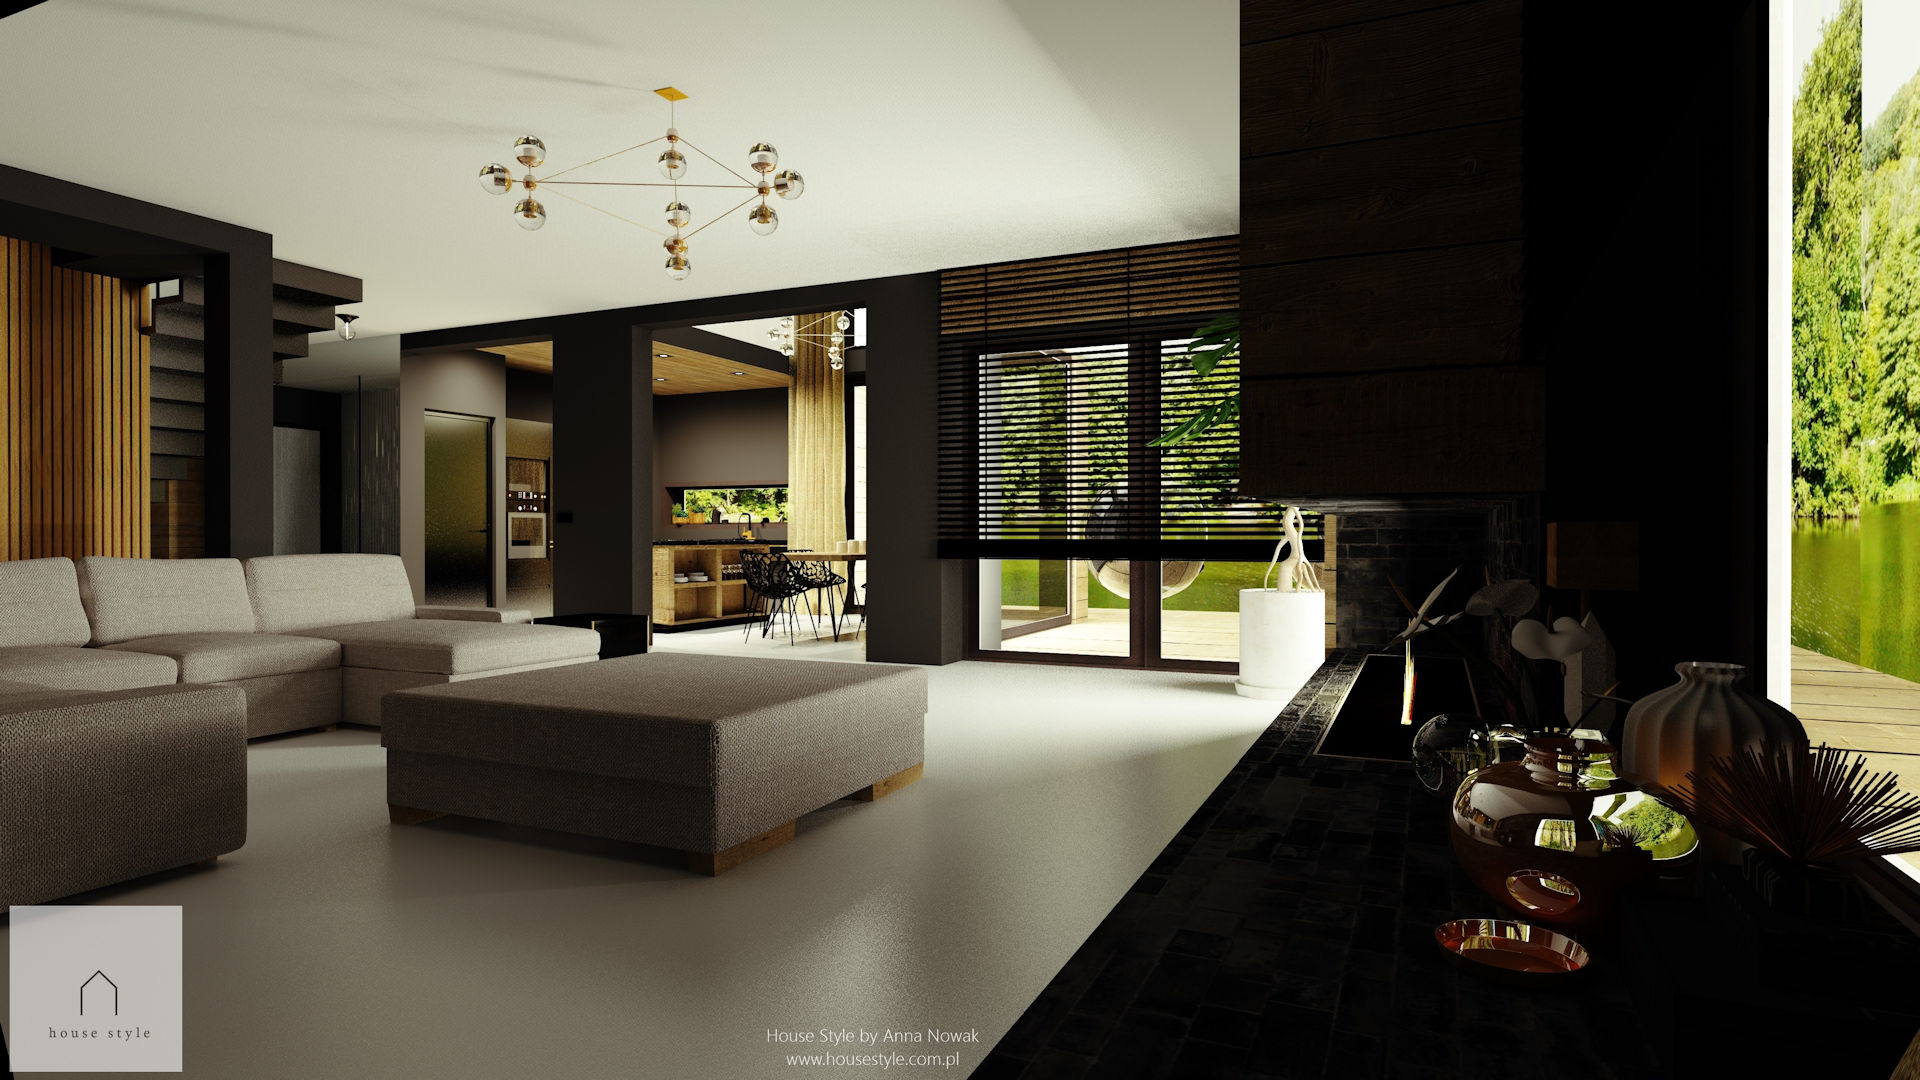 Projekt: House Style Anna Nowak